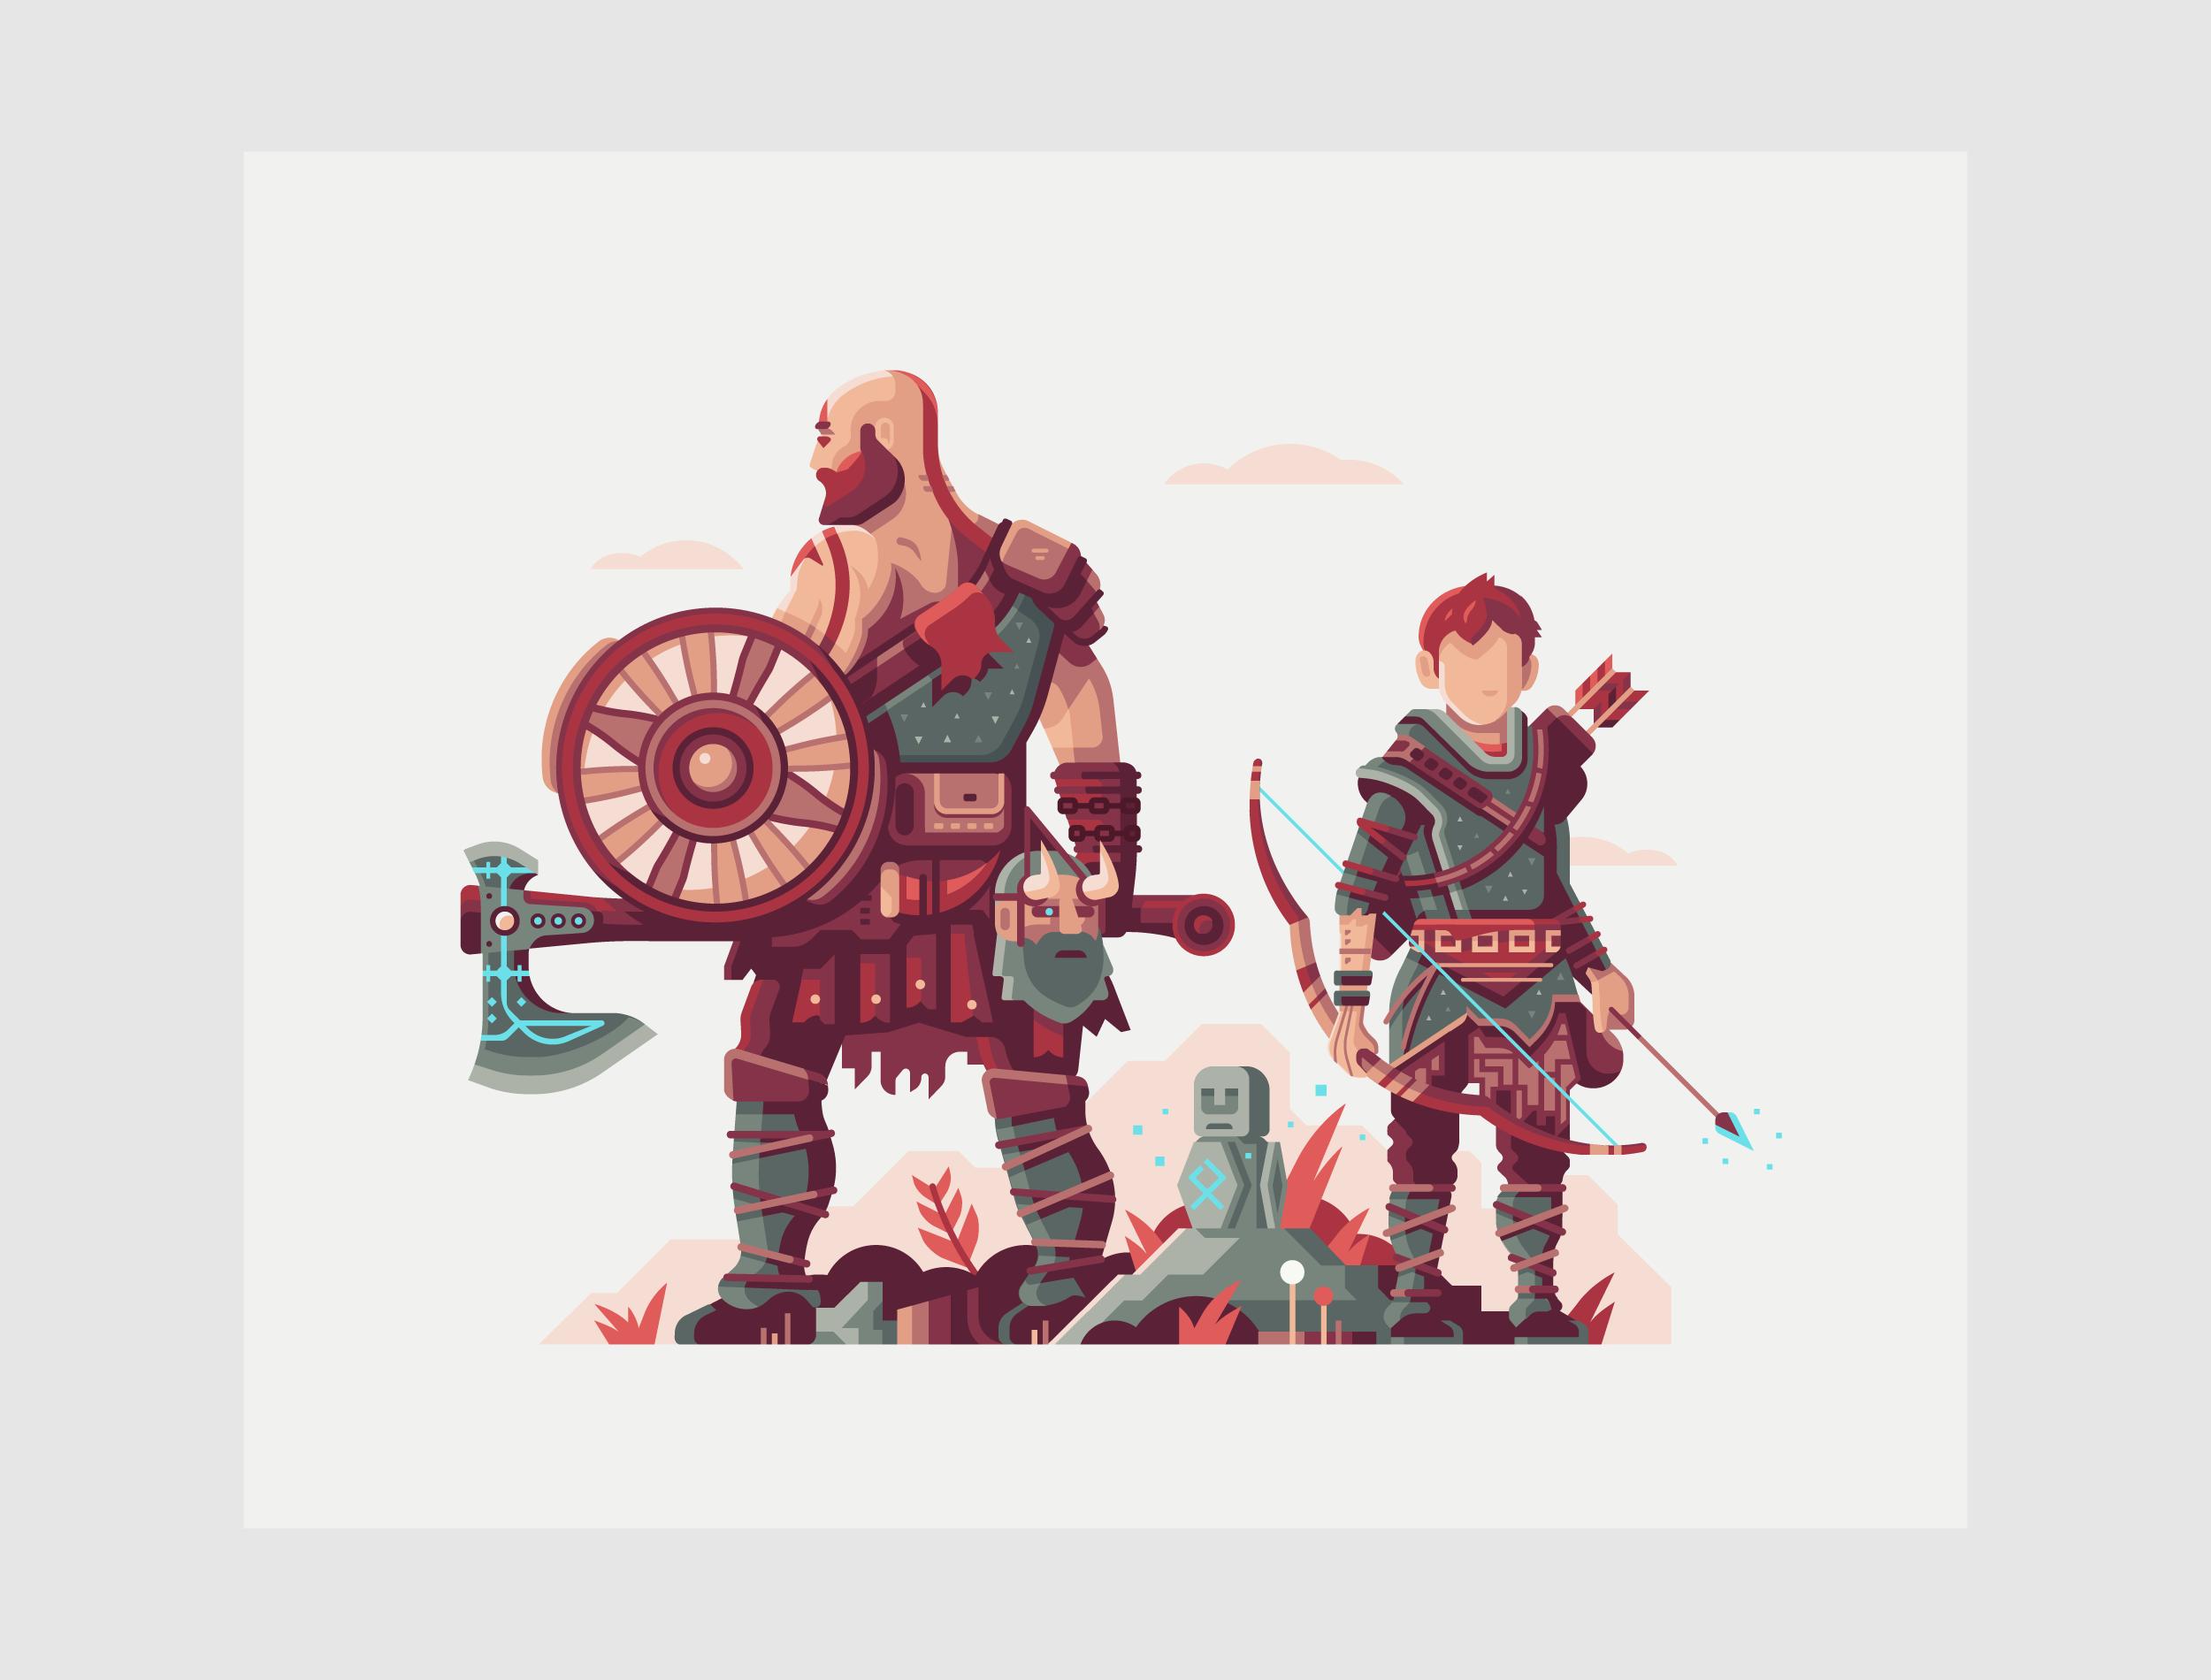 Warriors of Midgard by Matt Anderson. Inspired by God of War (2018).